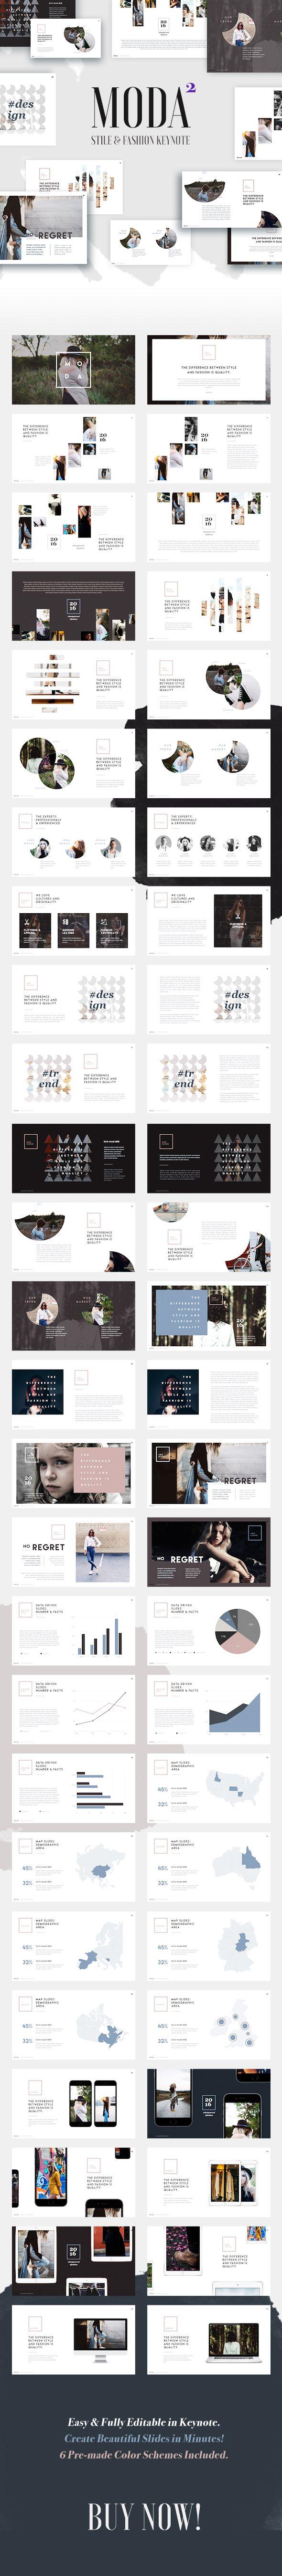 Moda 2  Fashion & Style Keynote Template  #1920x1080 #clean • Download ➝ https://graphicriver.net/item/moda-2-fashion-style-keynote-template/18346922?ref=pxcr